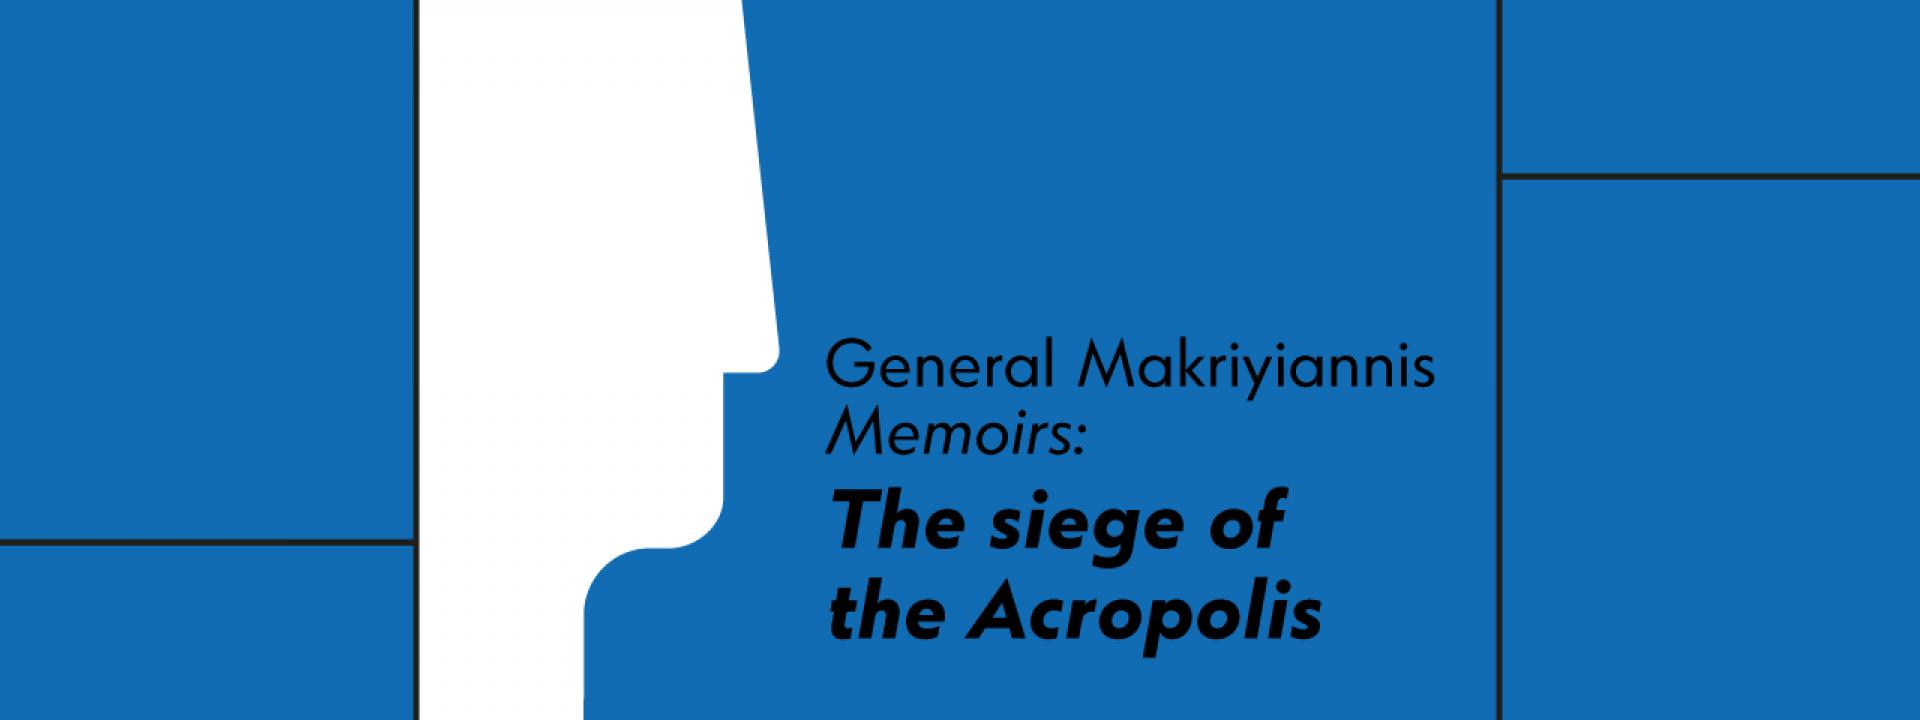 Parabases: Faces of the Hero | General Makriyiannis, Memoirs: the siege of the Acropolis - Εικόνα